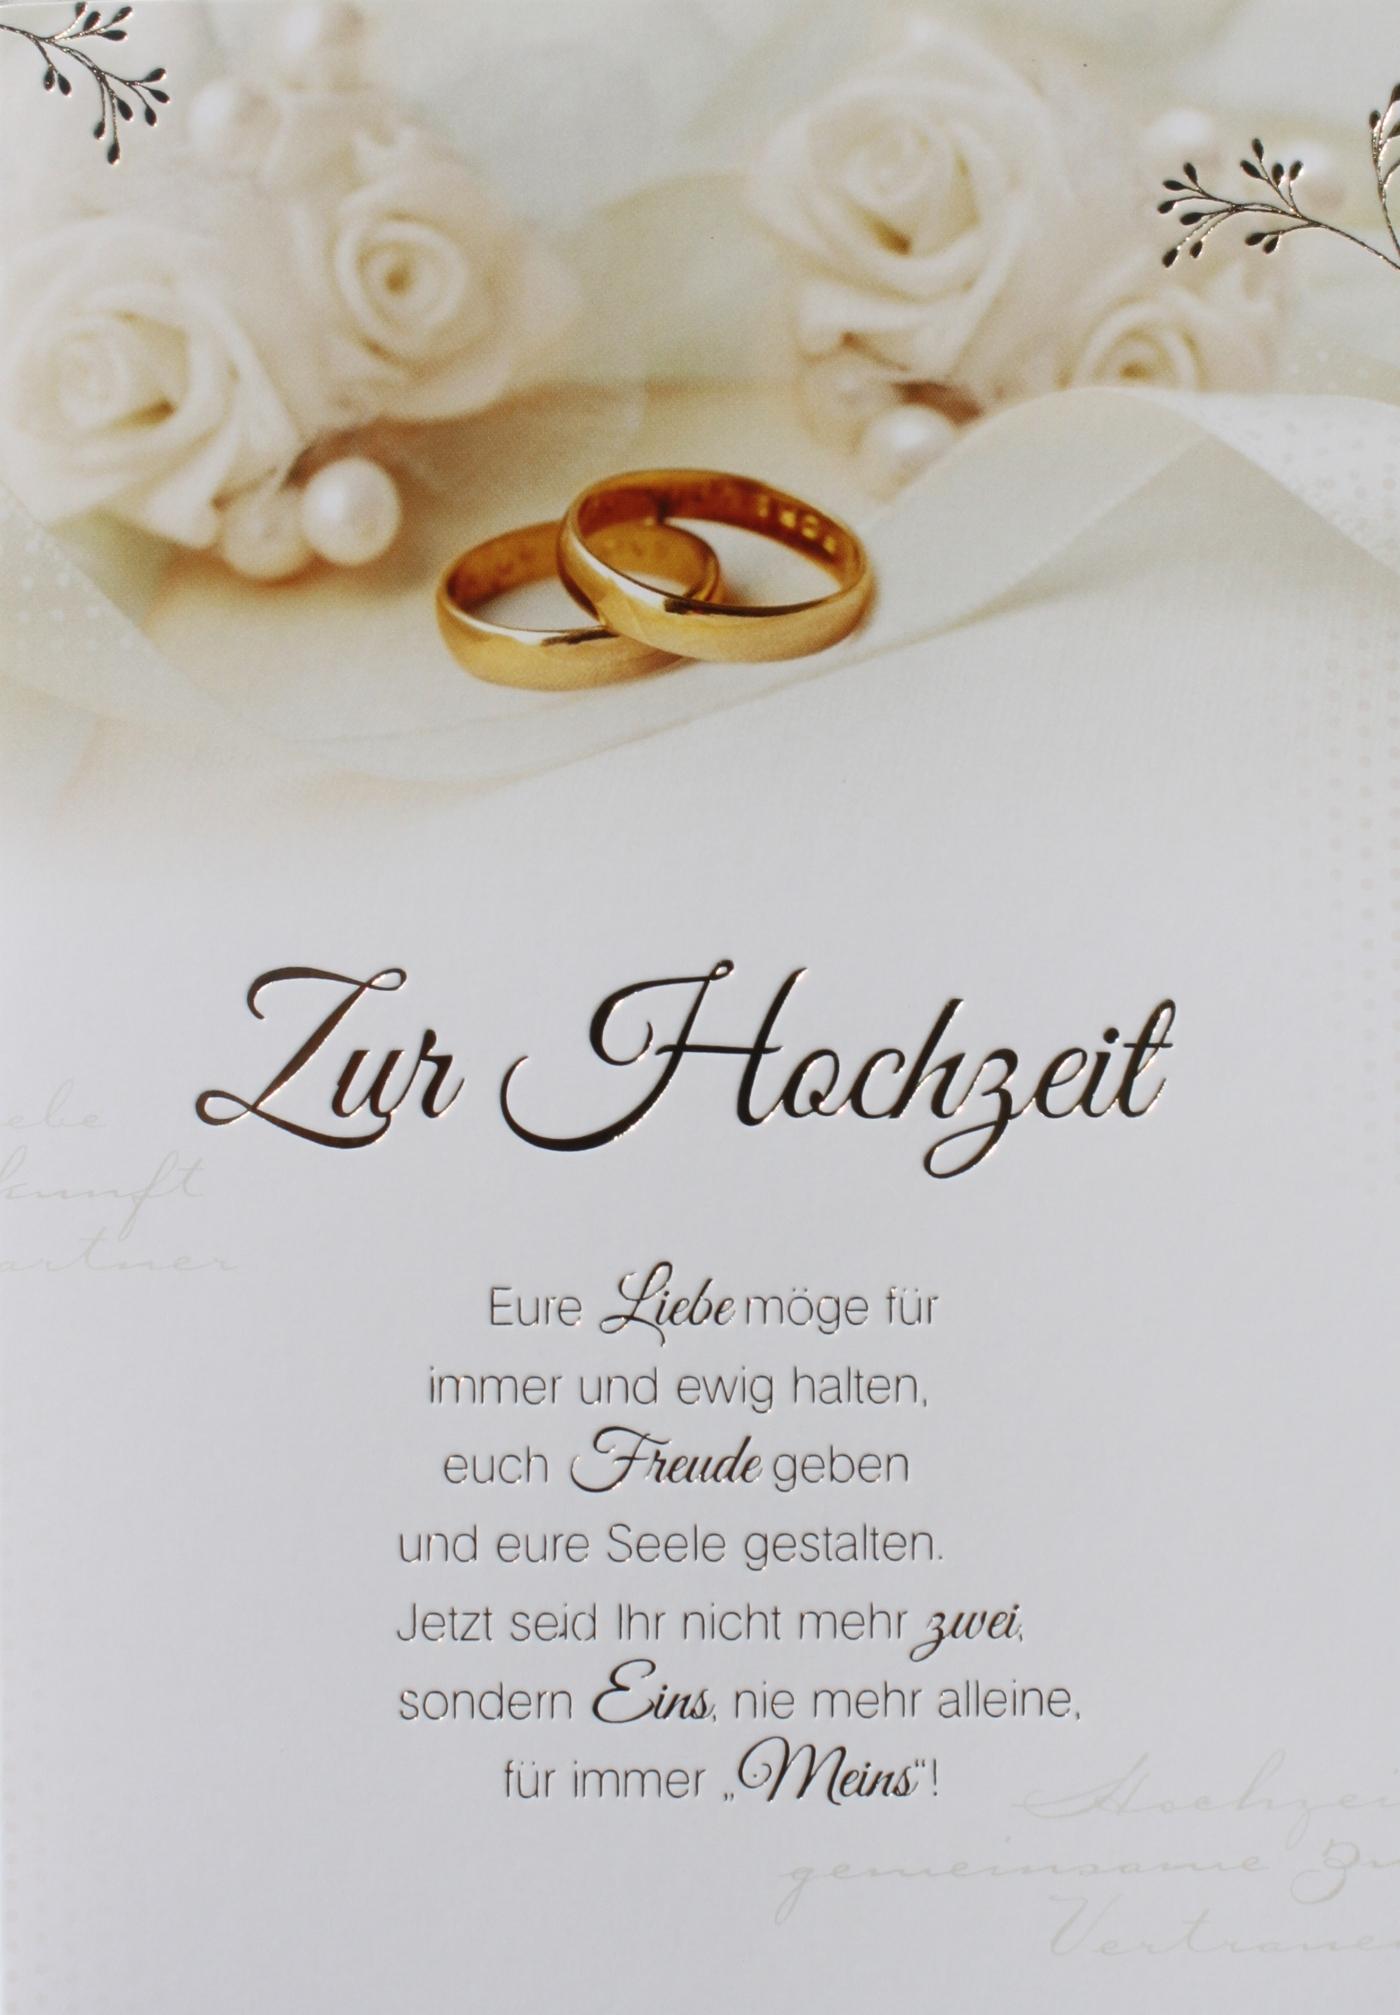 D200 Hochzeit - Glückwunschkarten Großhandel